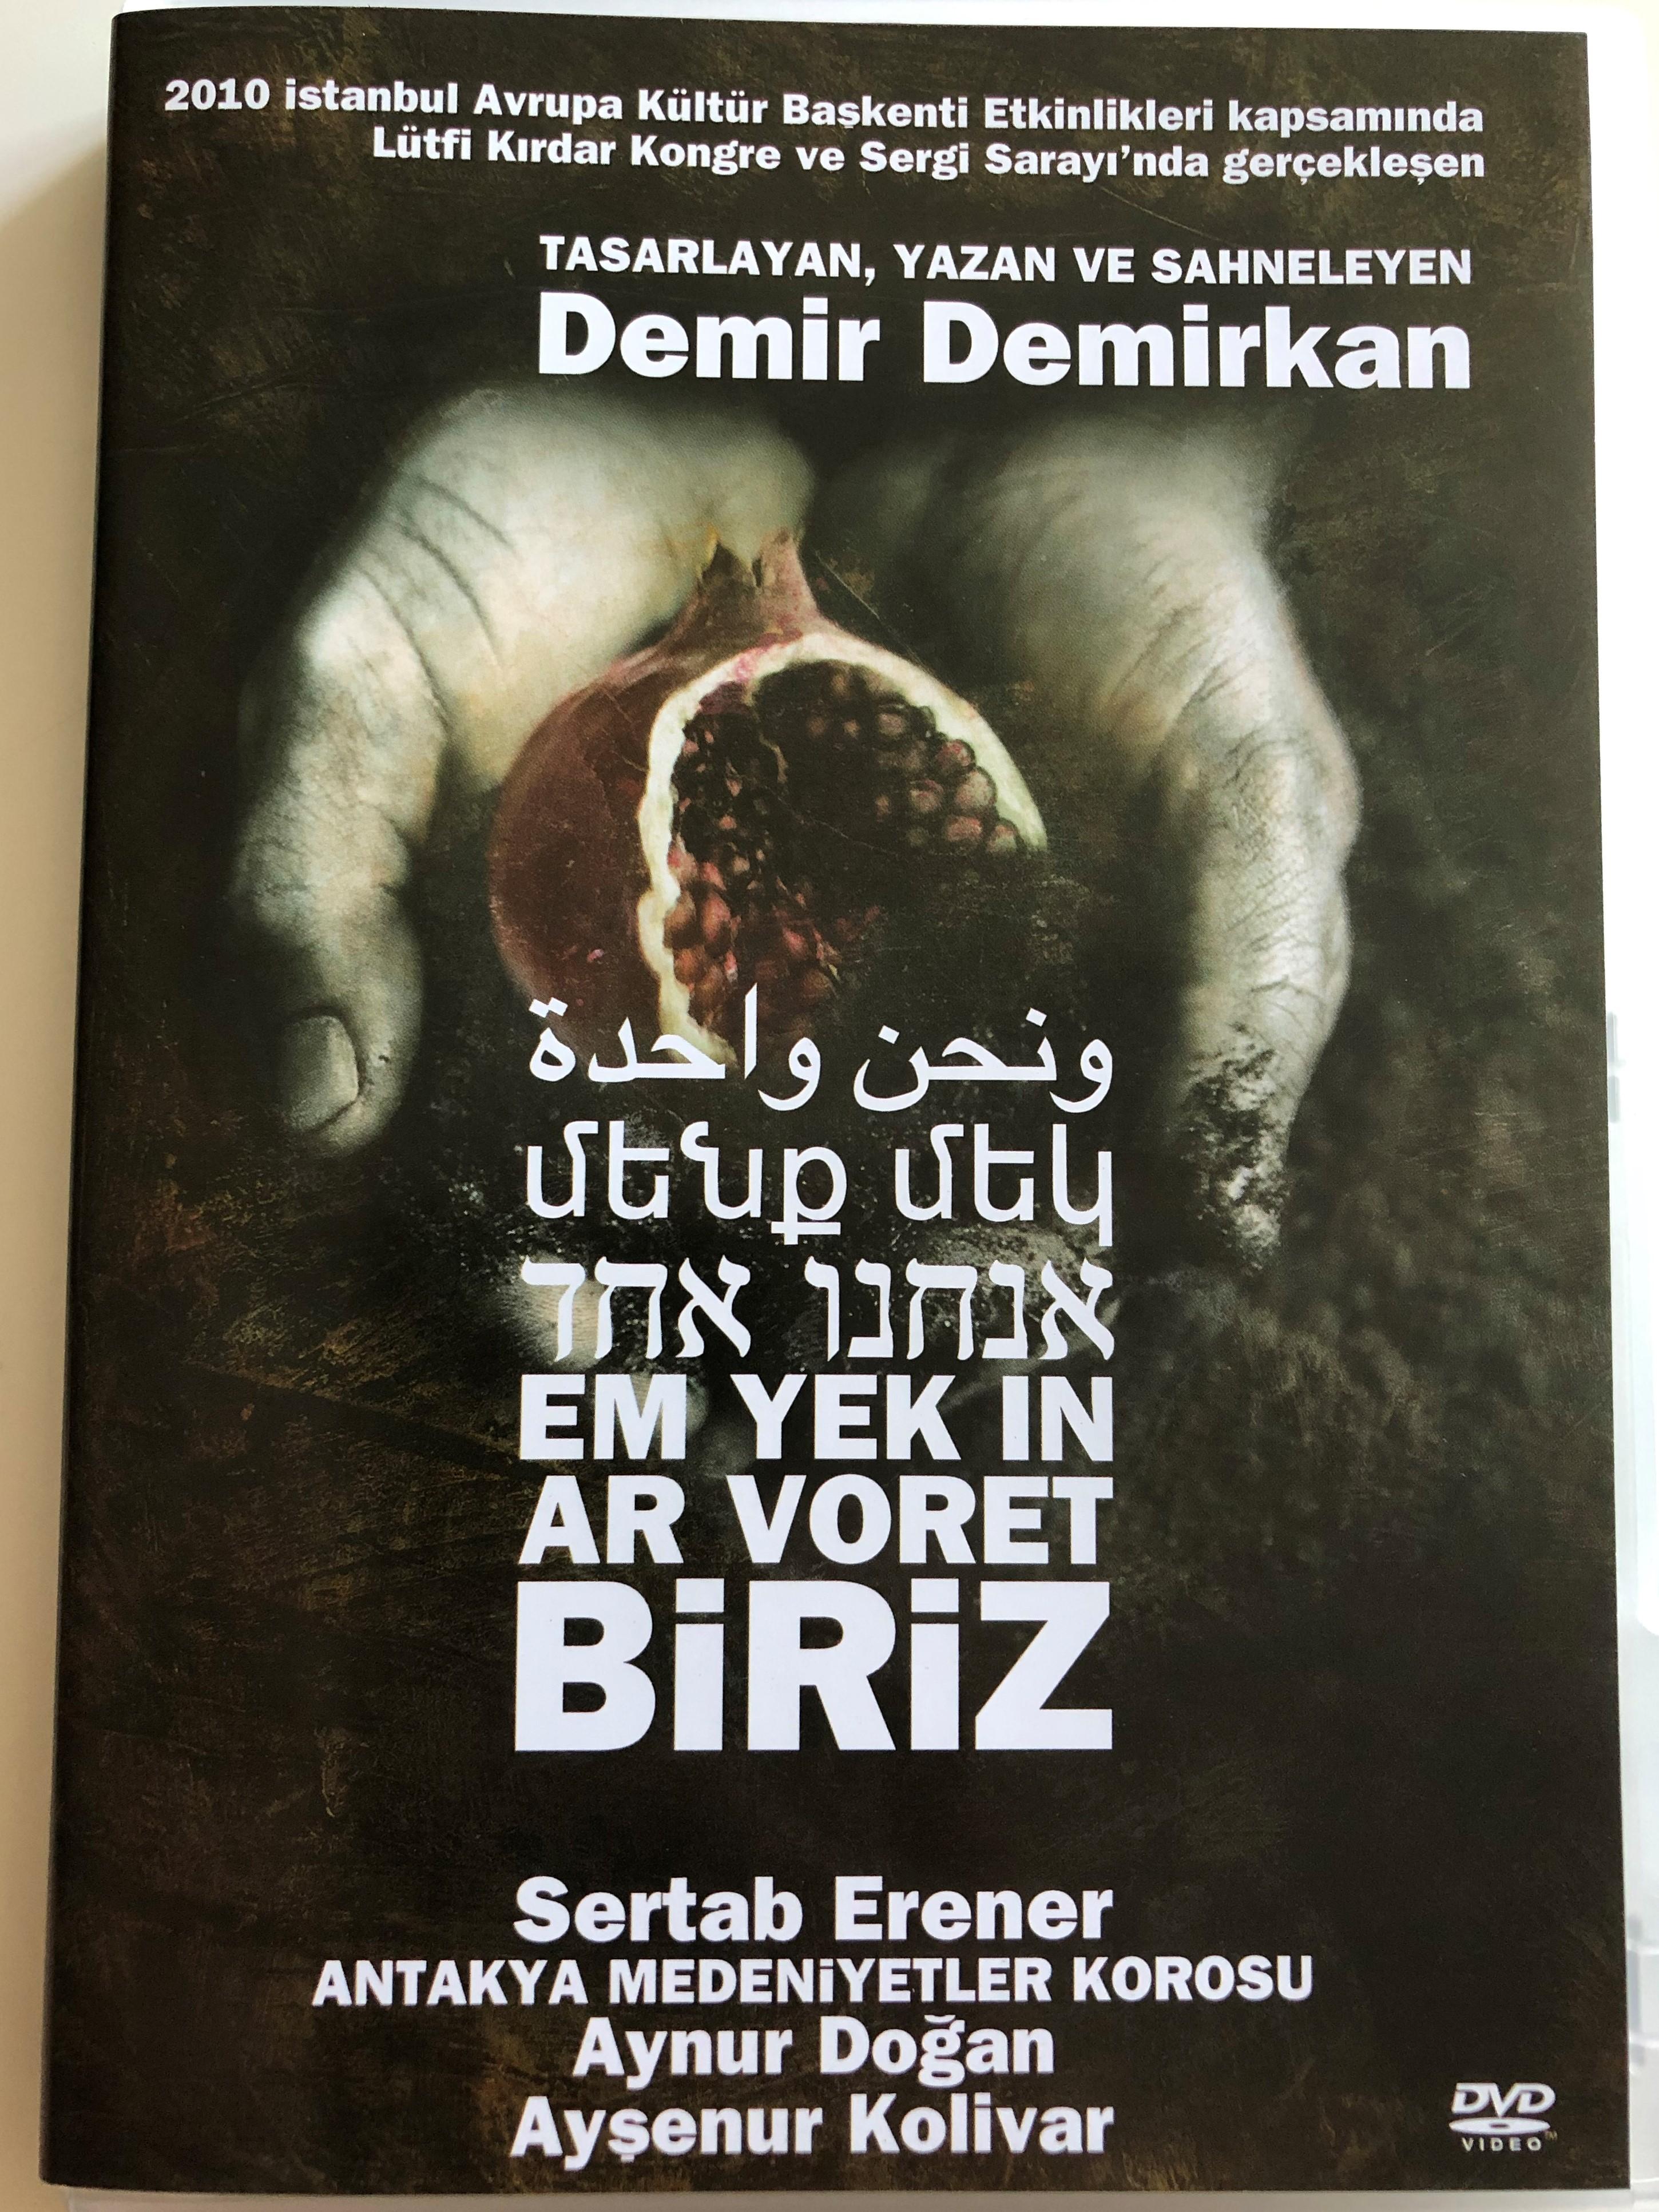 demir-demirkan-em-yek-in-ar-voret-biriz-concert-dvd-2010-sertab-erener-antakya-medeniyetler-korosu-aynur-dogan-aysenur-kolivar-1-.jpg